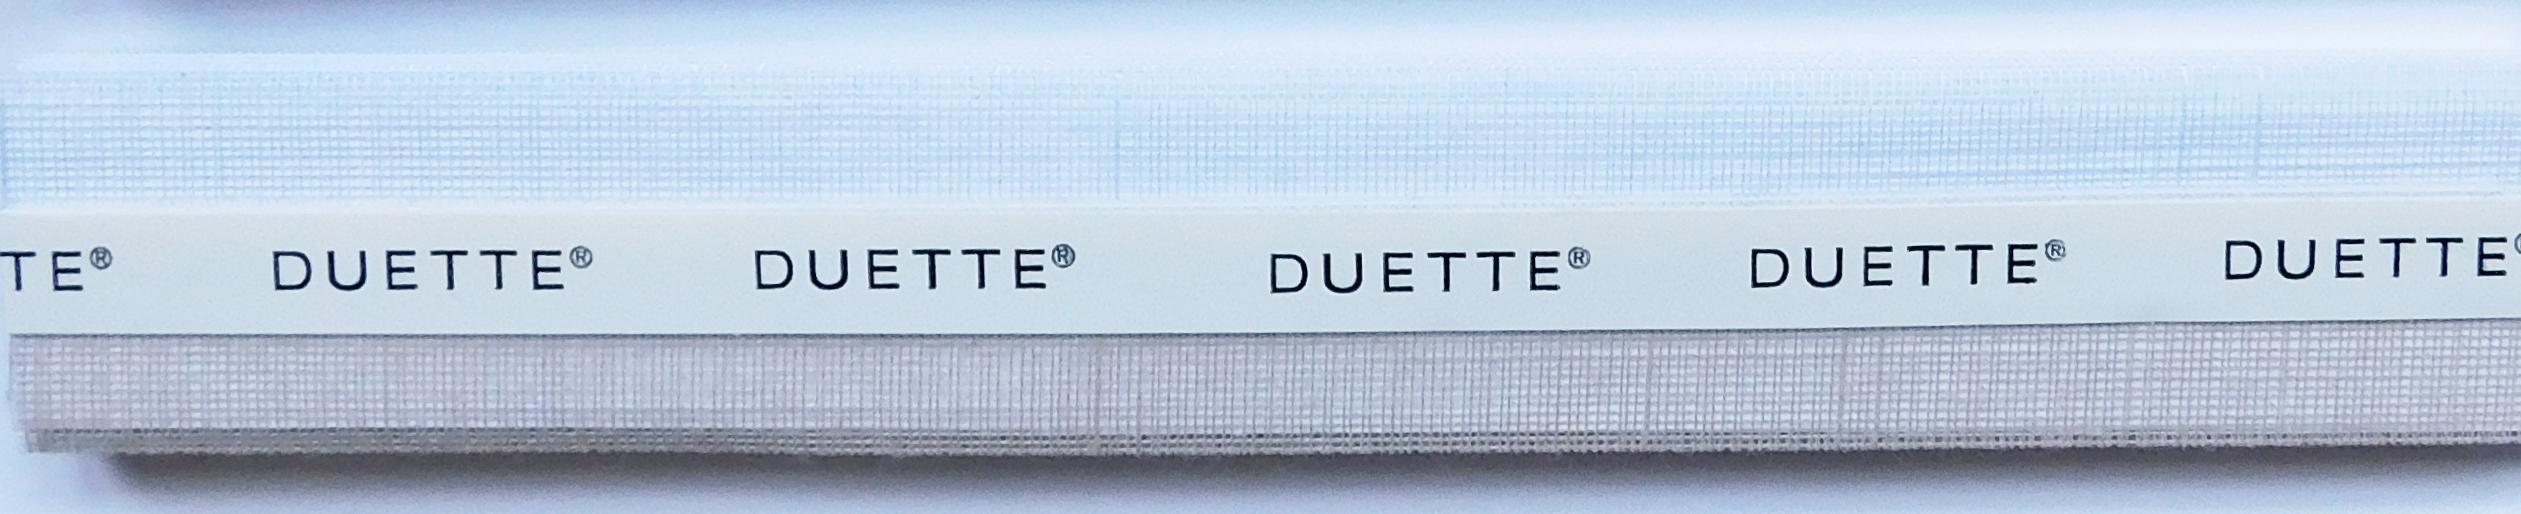 Batiste Sheer Oyster Duette Blind Fabric Sample